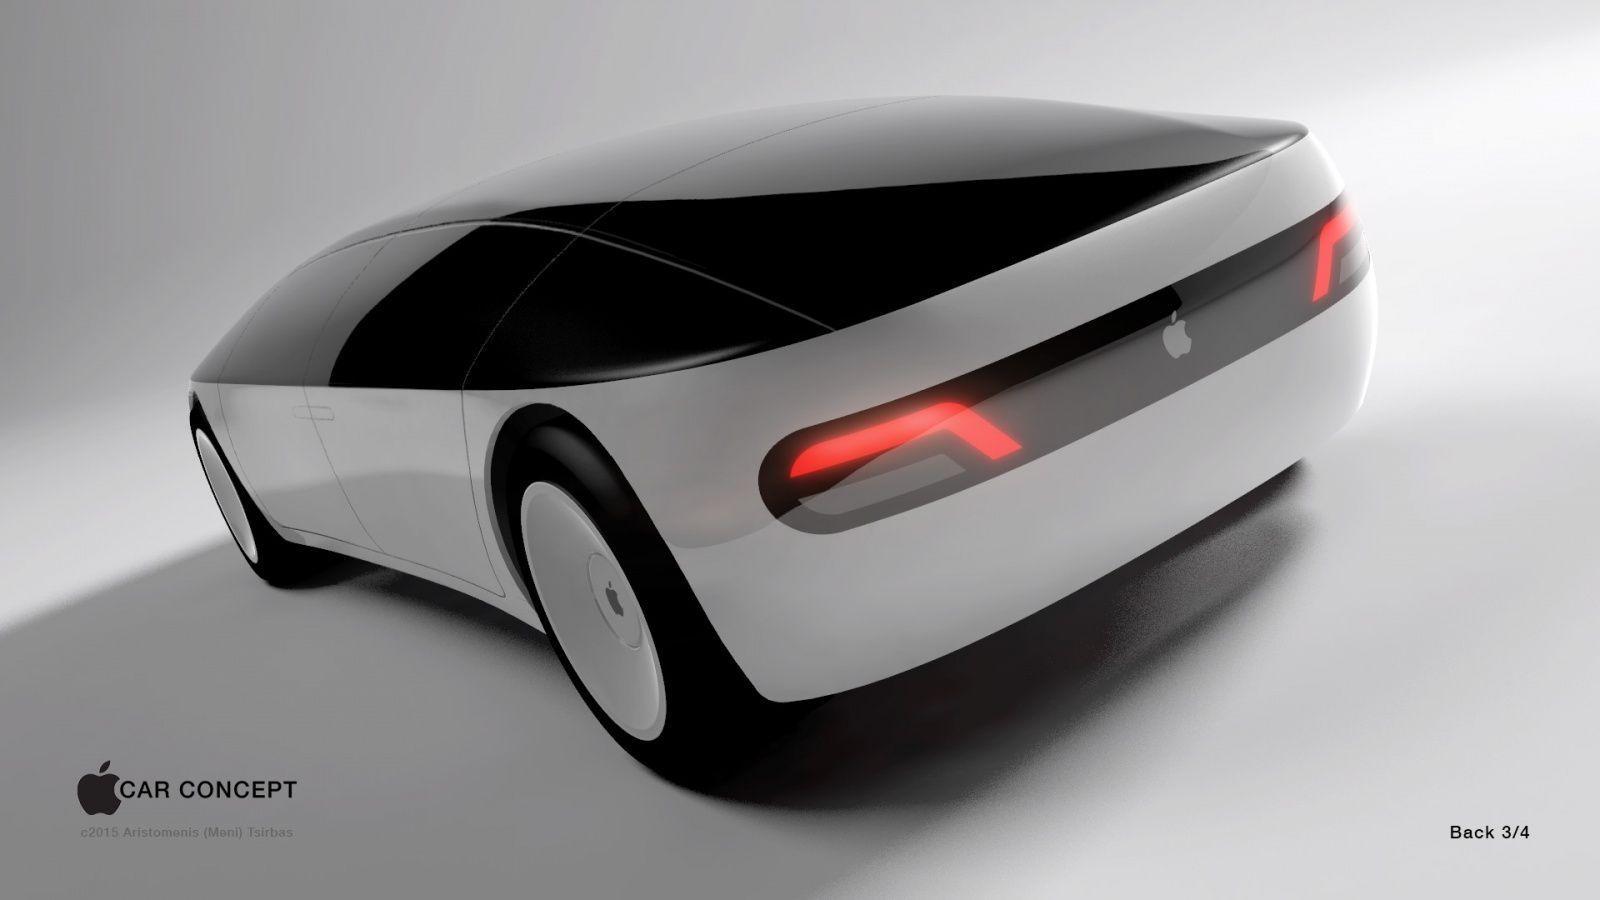 New York Times: Apple legger autobilplanene på hylla